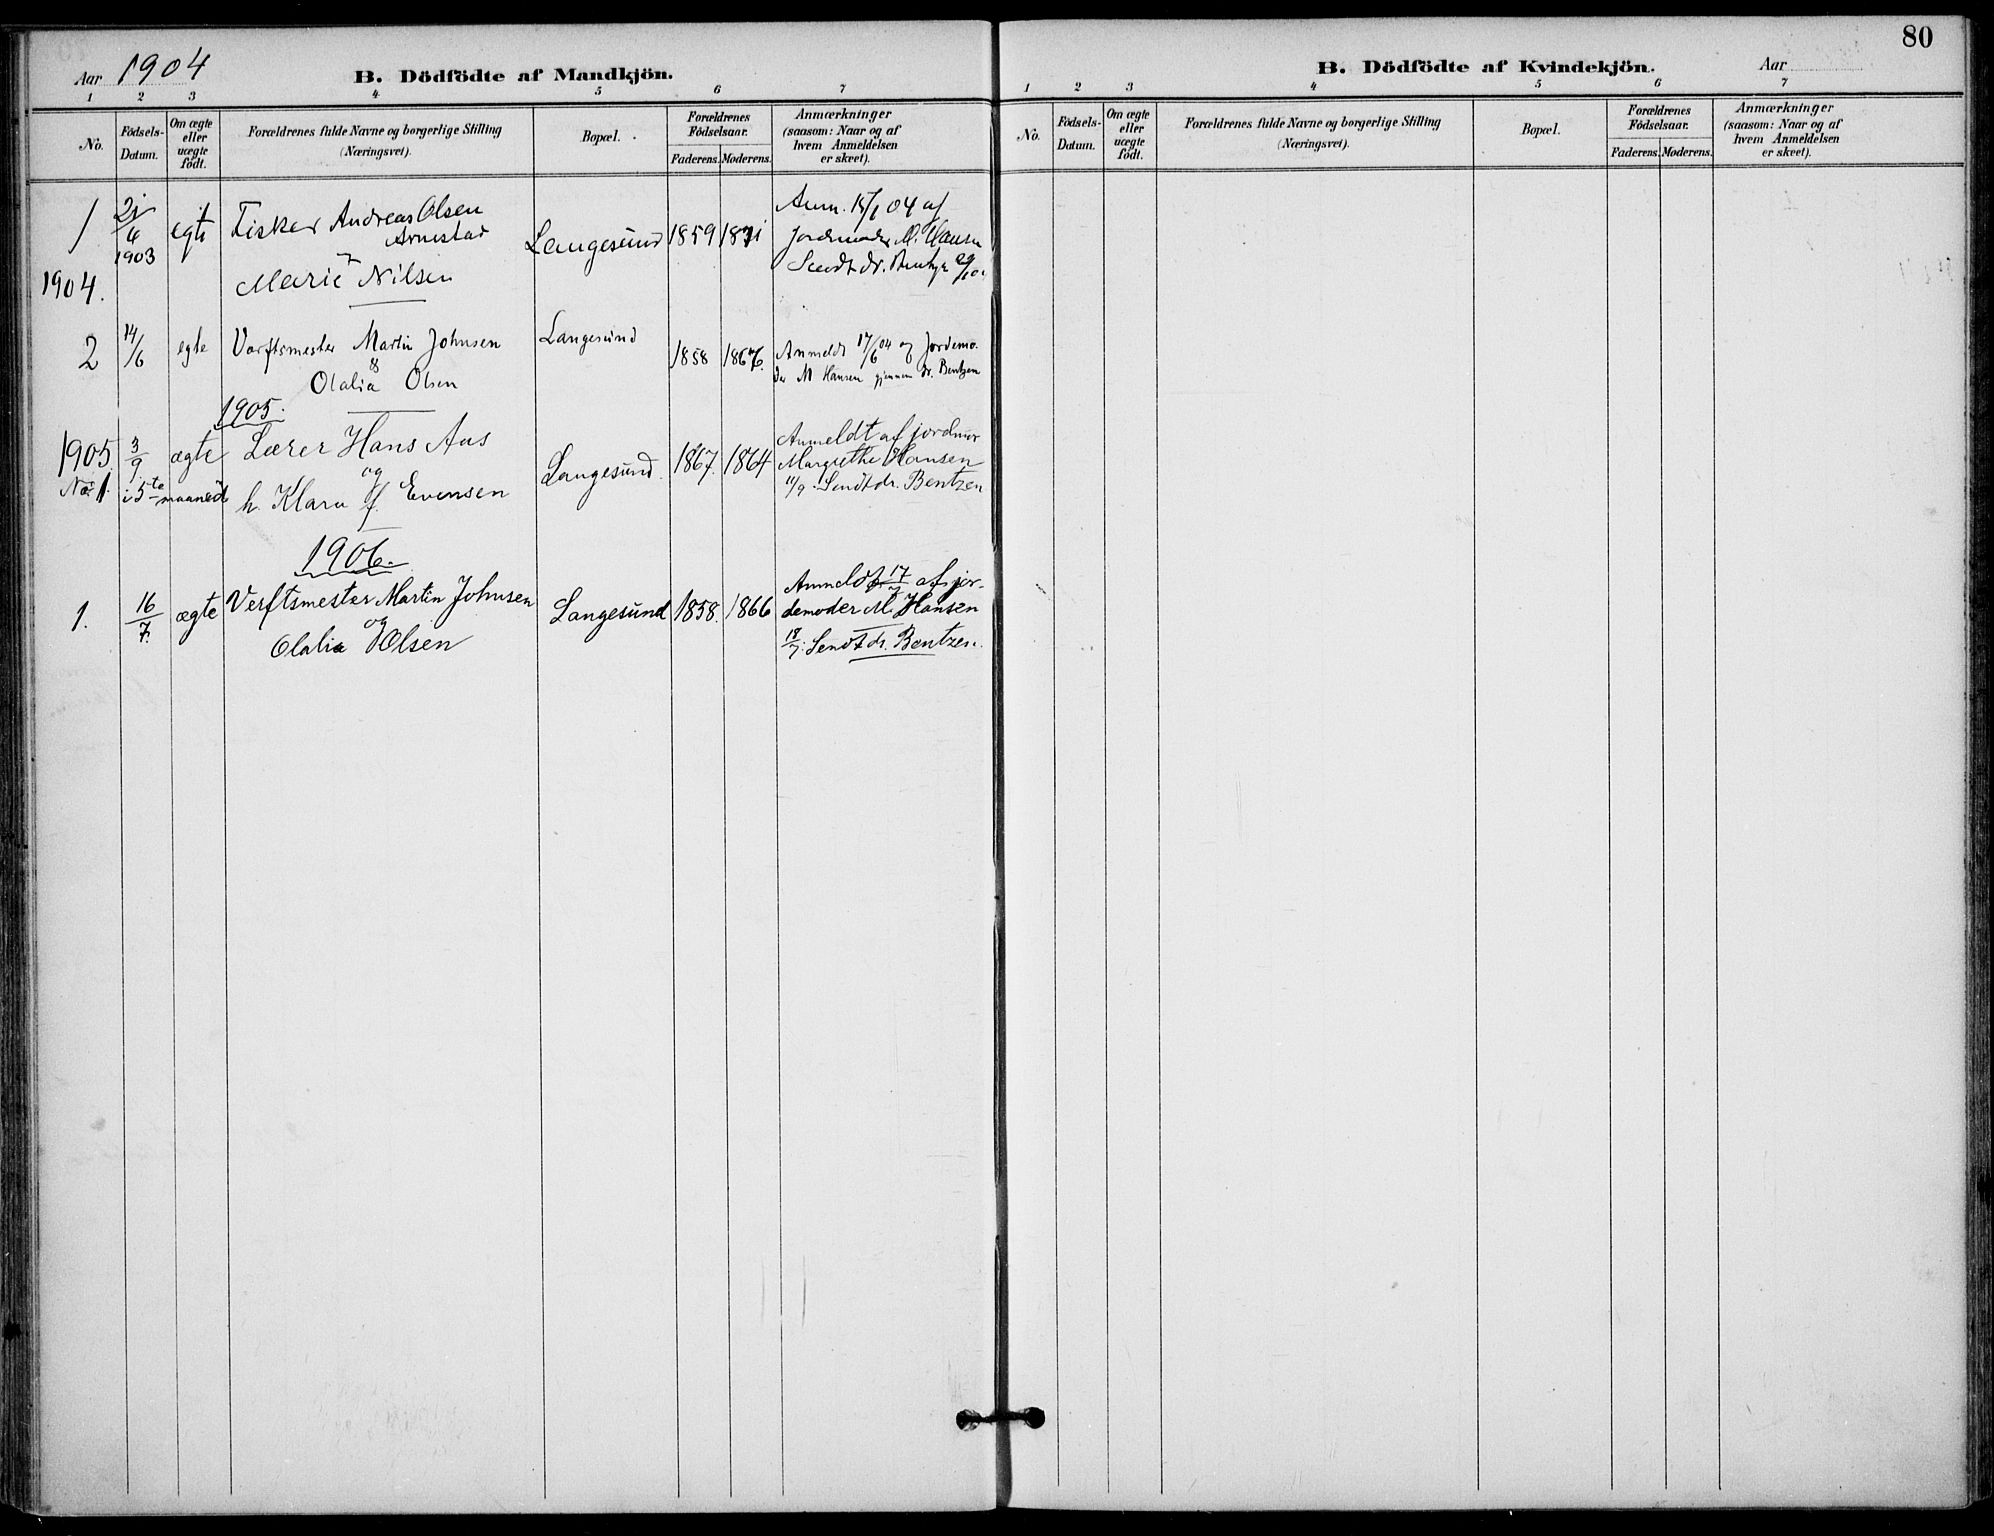 SAKO, Langesund kirkebøker, F/Fa/L0003: Ministerialbok nr. 3, 1893-1907, s. 80